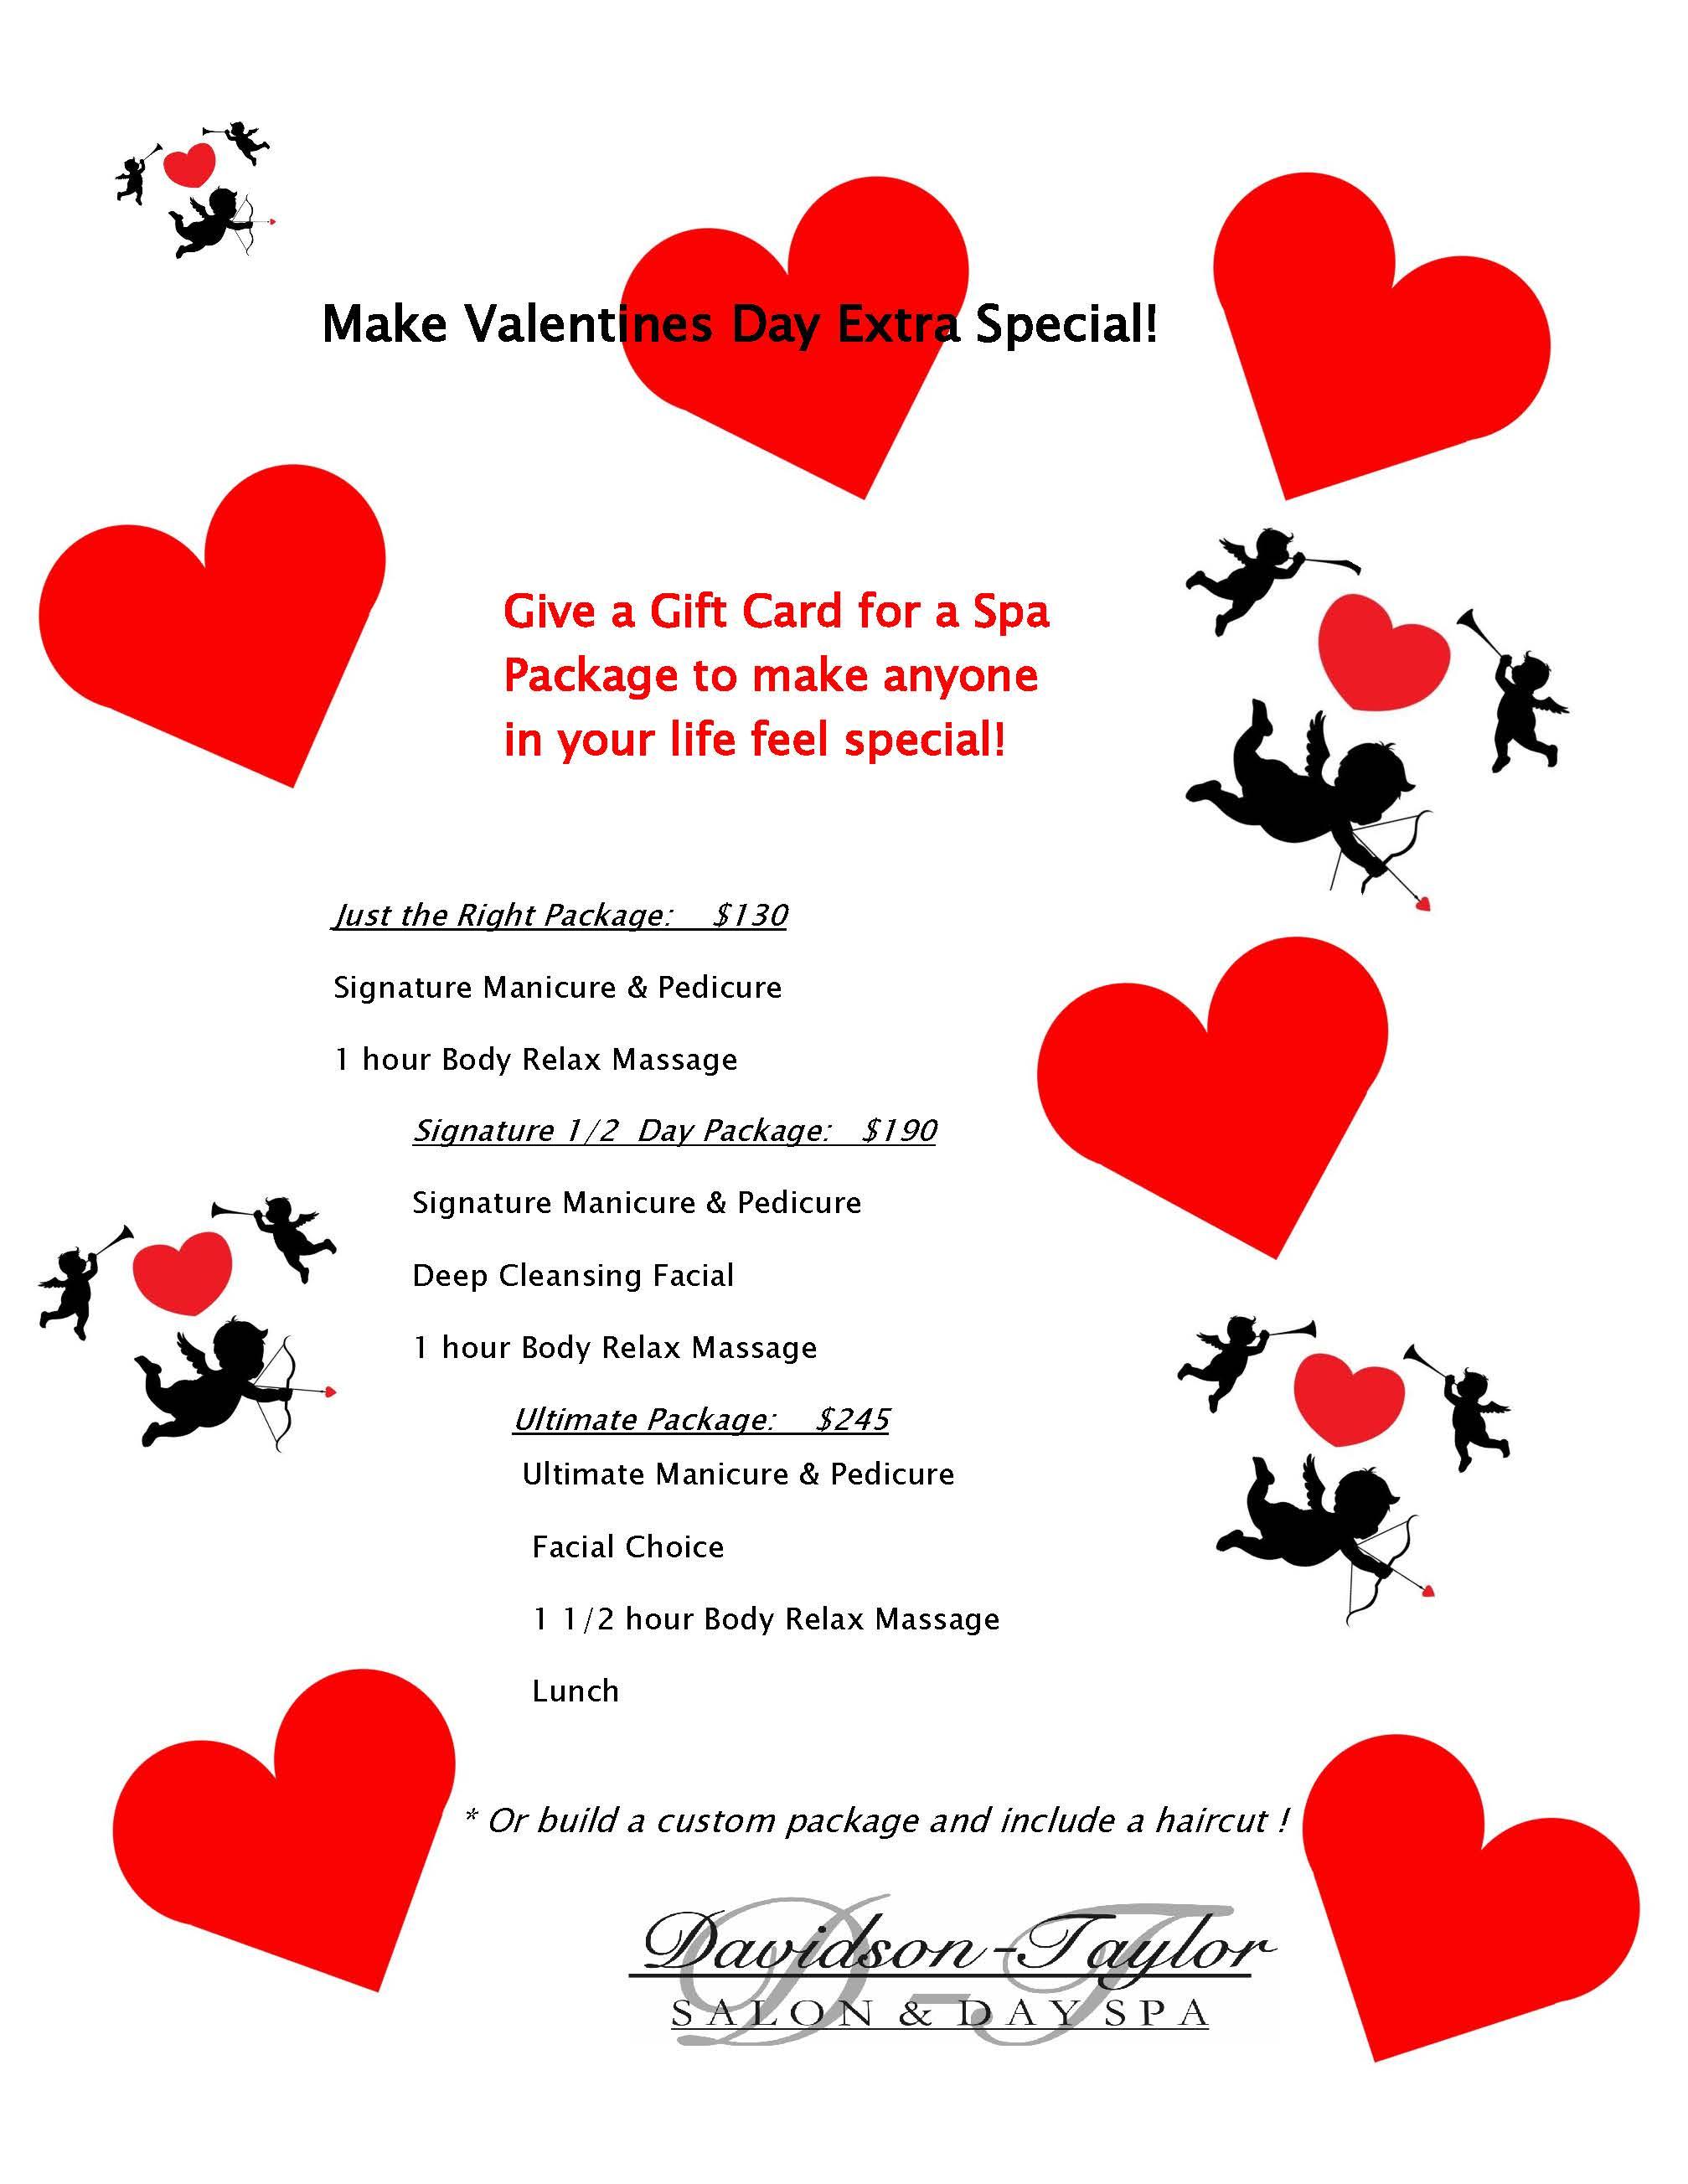 Valentines Specials Davidson Taylor Spa